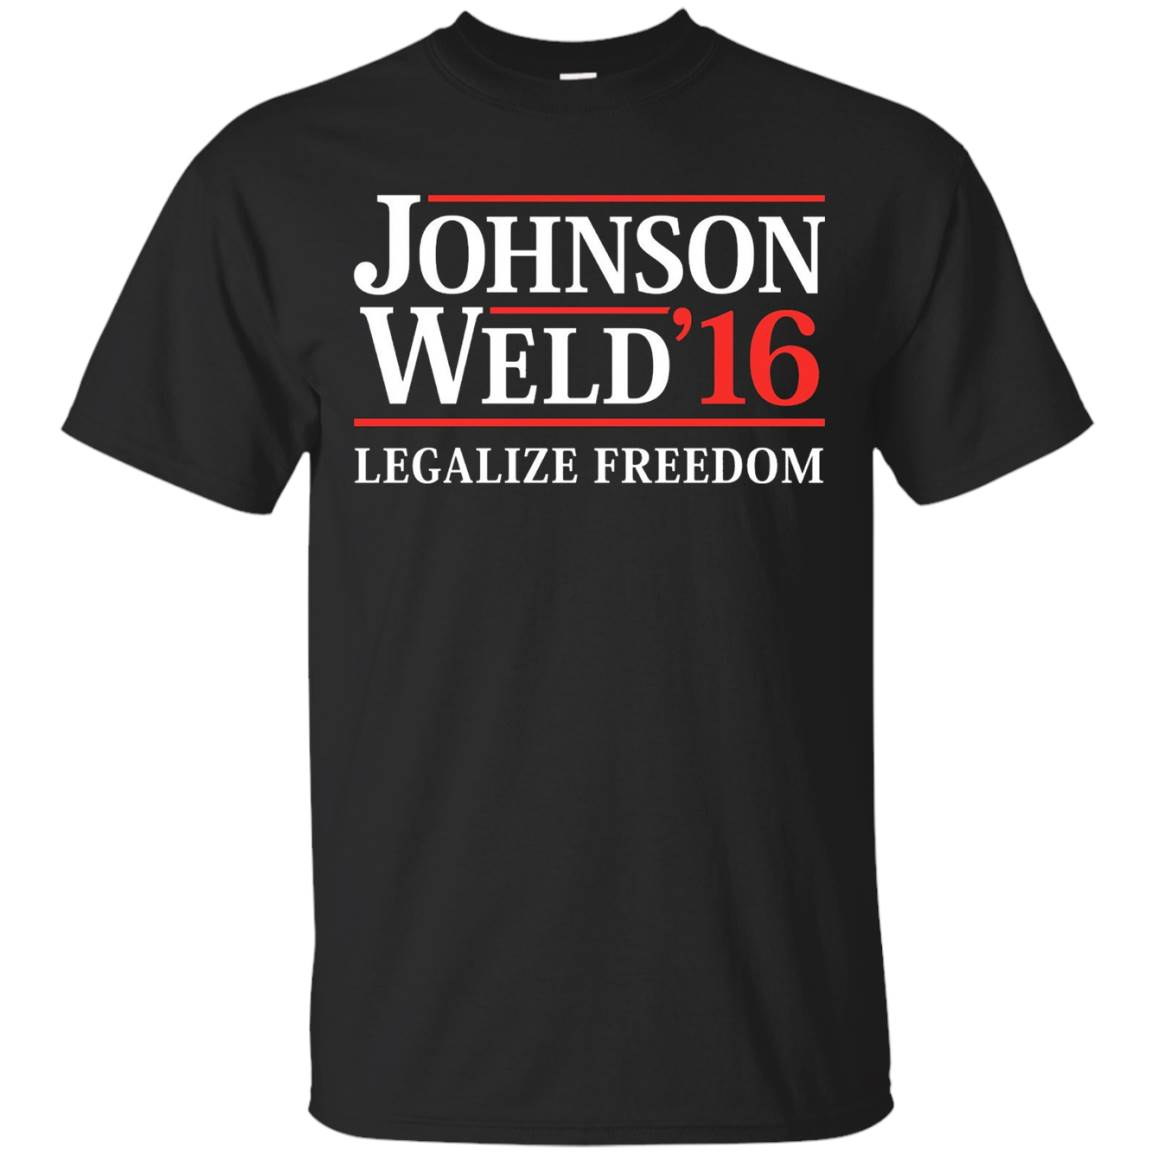 Johnson Weld '16 Legalize Freedom T-Shirt